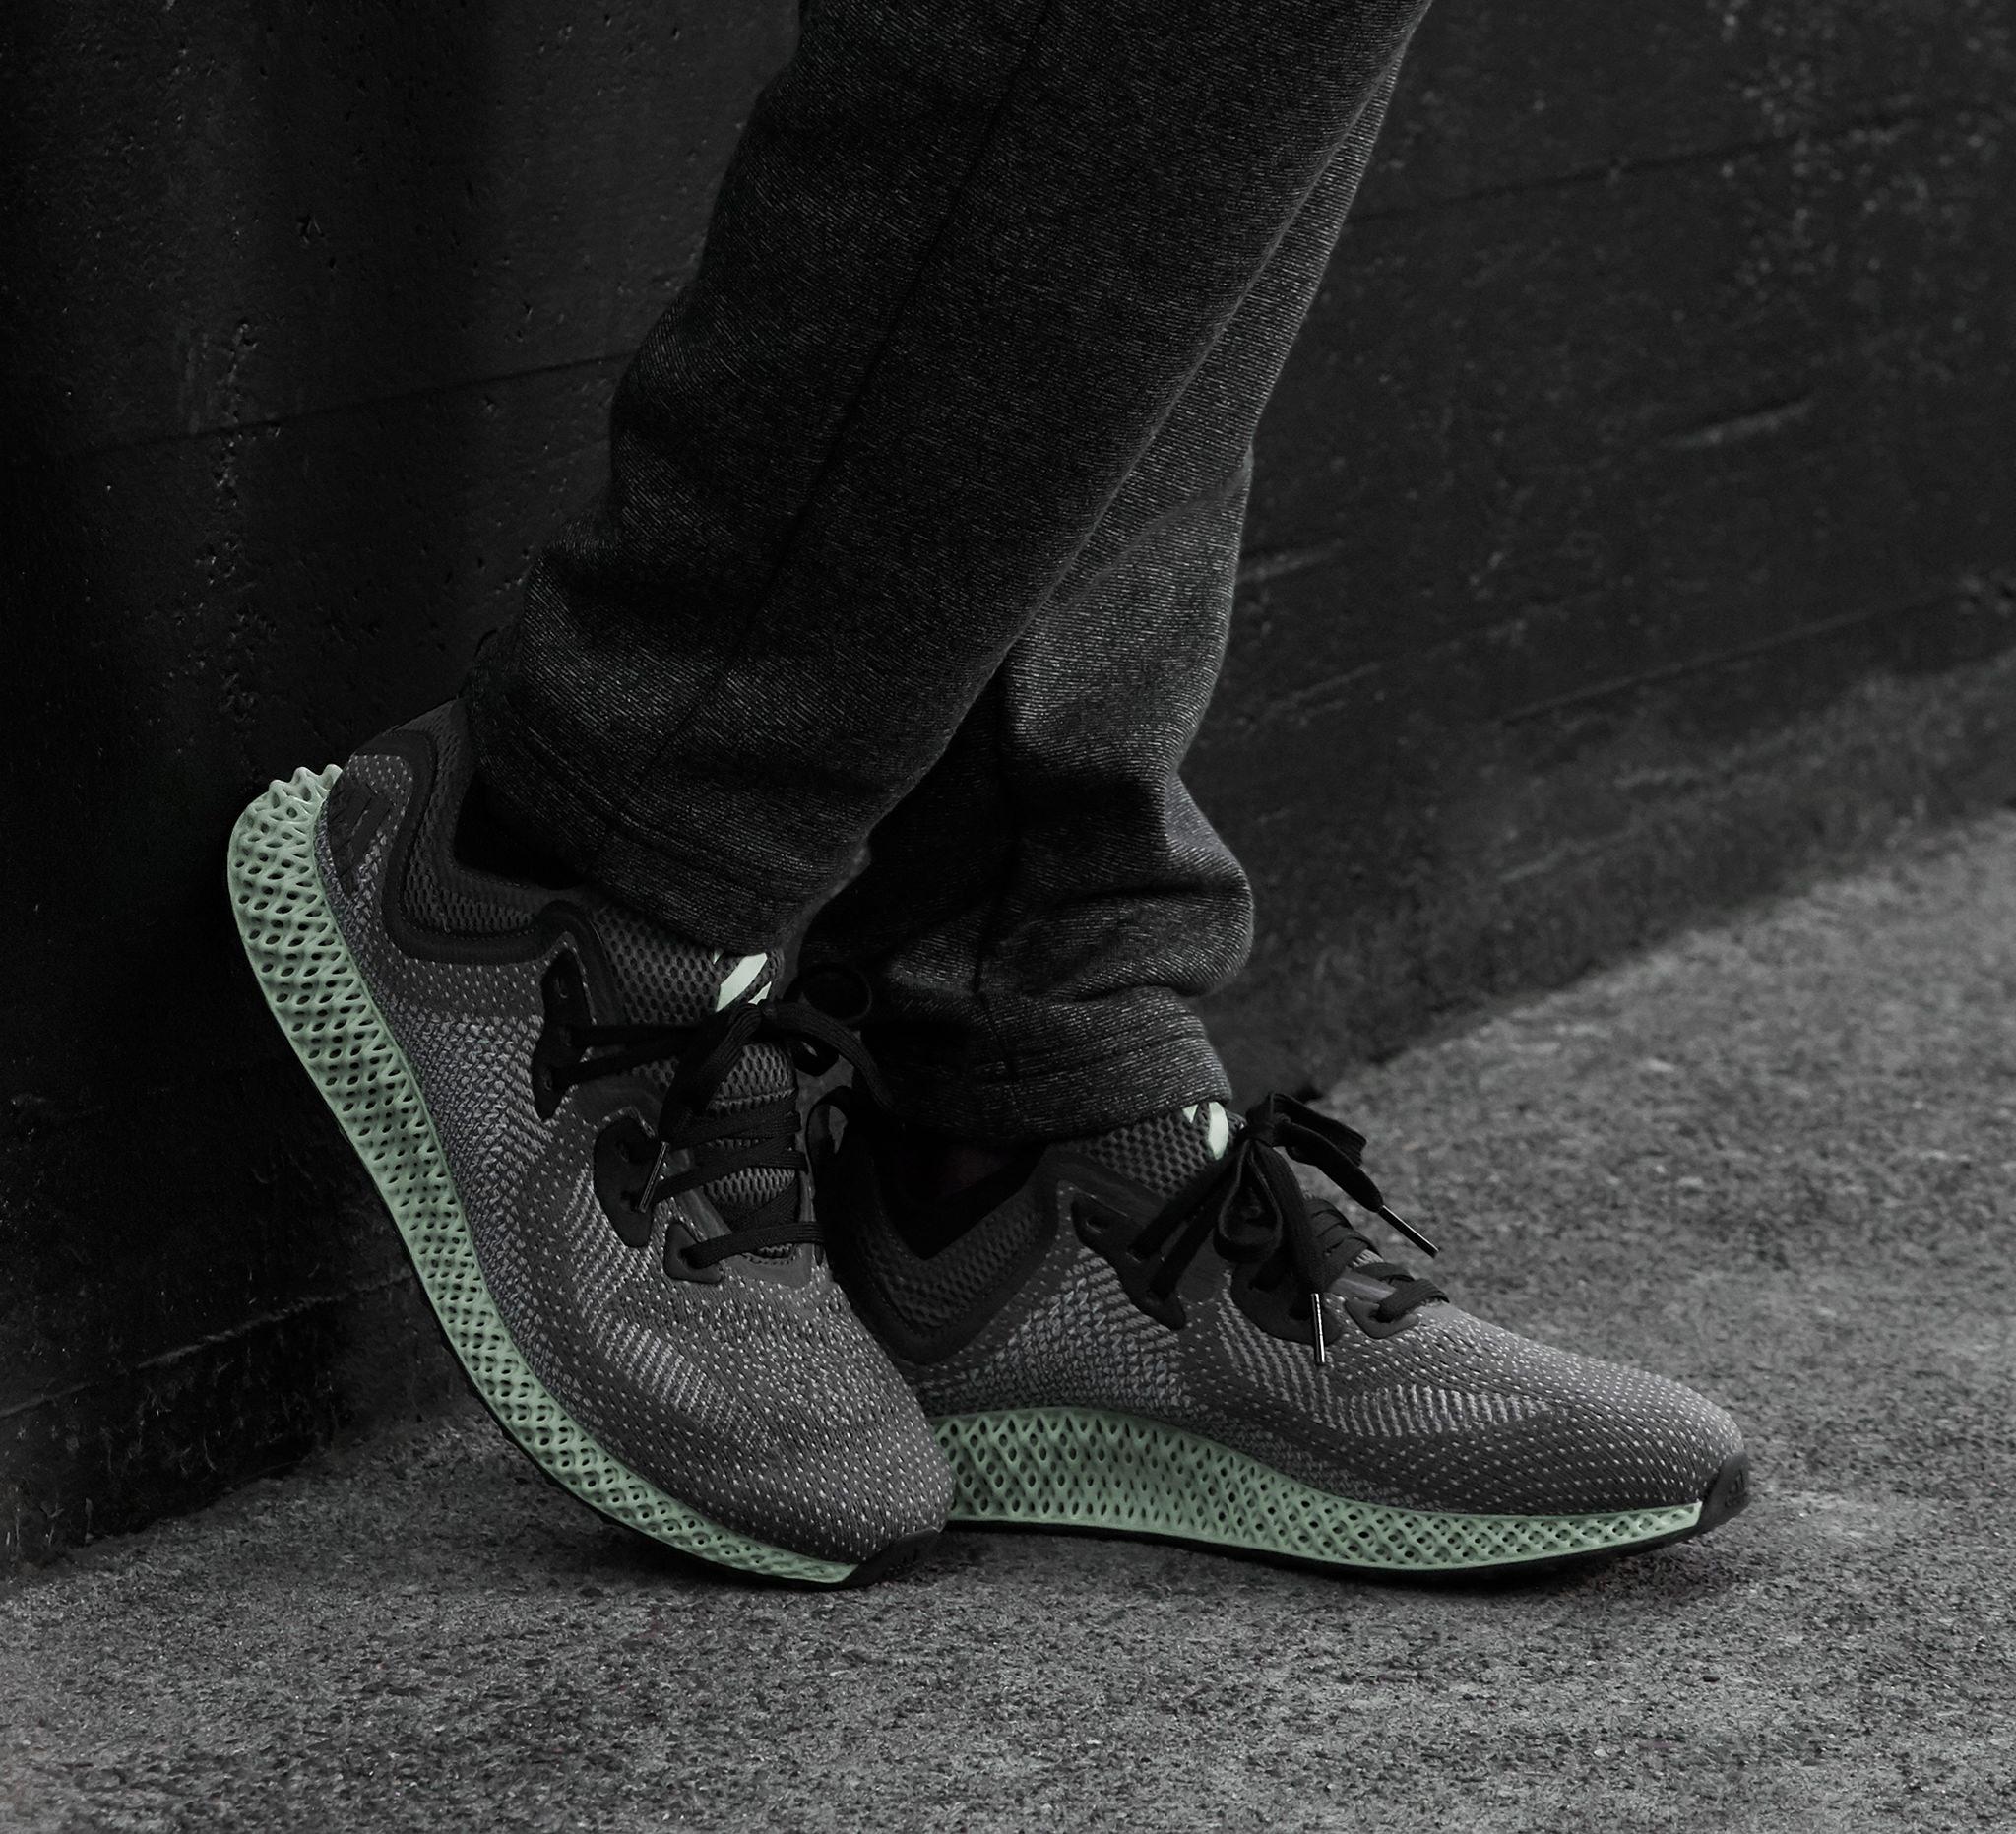 AlphaEDGE-4D-LTD-3d-print-sneakers-3